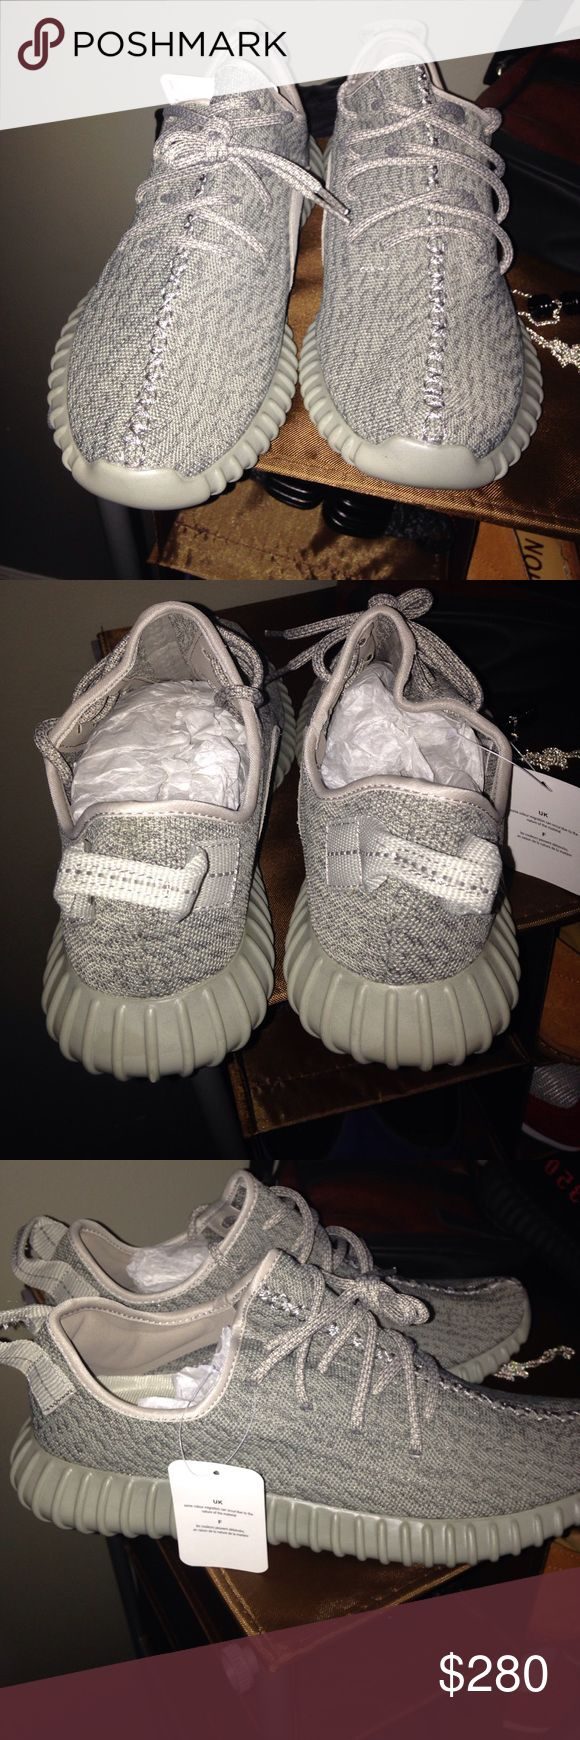 yeezy boost 350 moonrock box adidas r1 nmd white